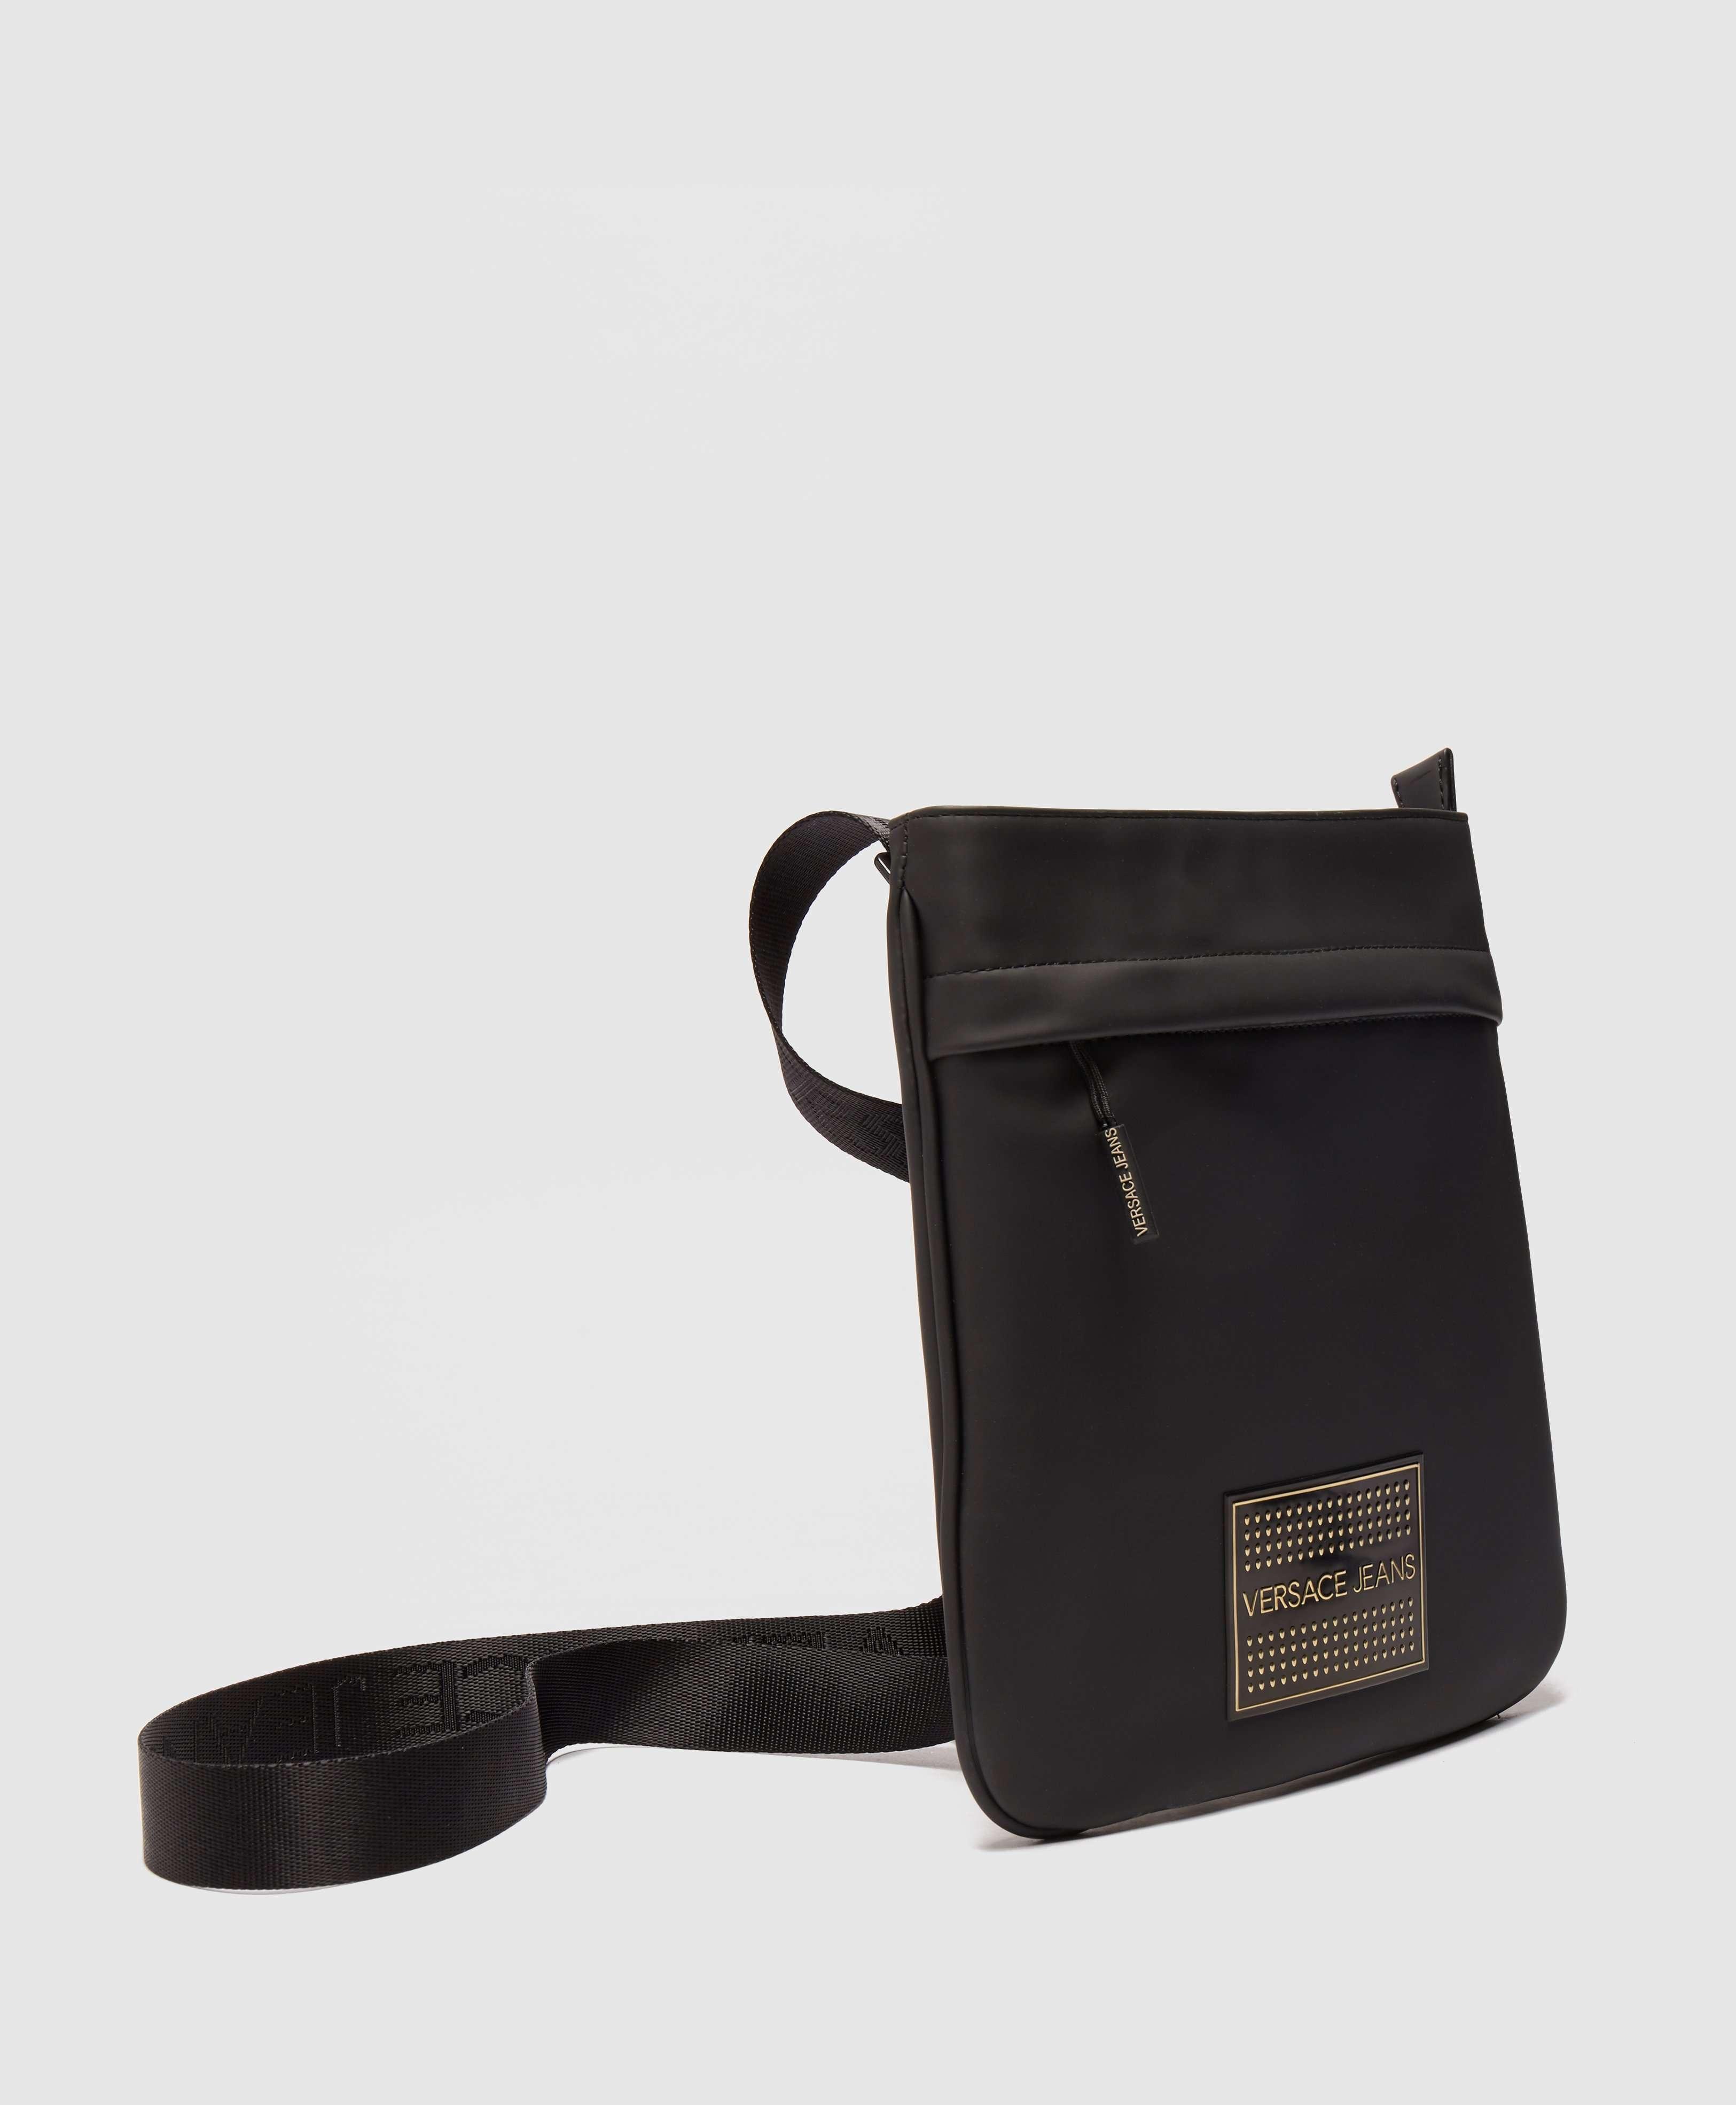 Versace Jeans Plaque Logo Small Item Bag